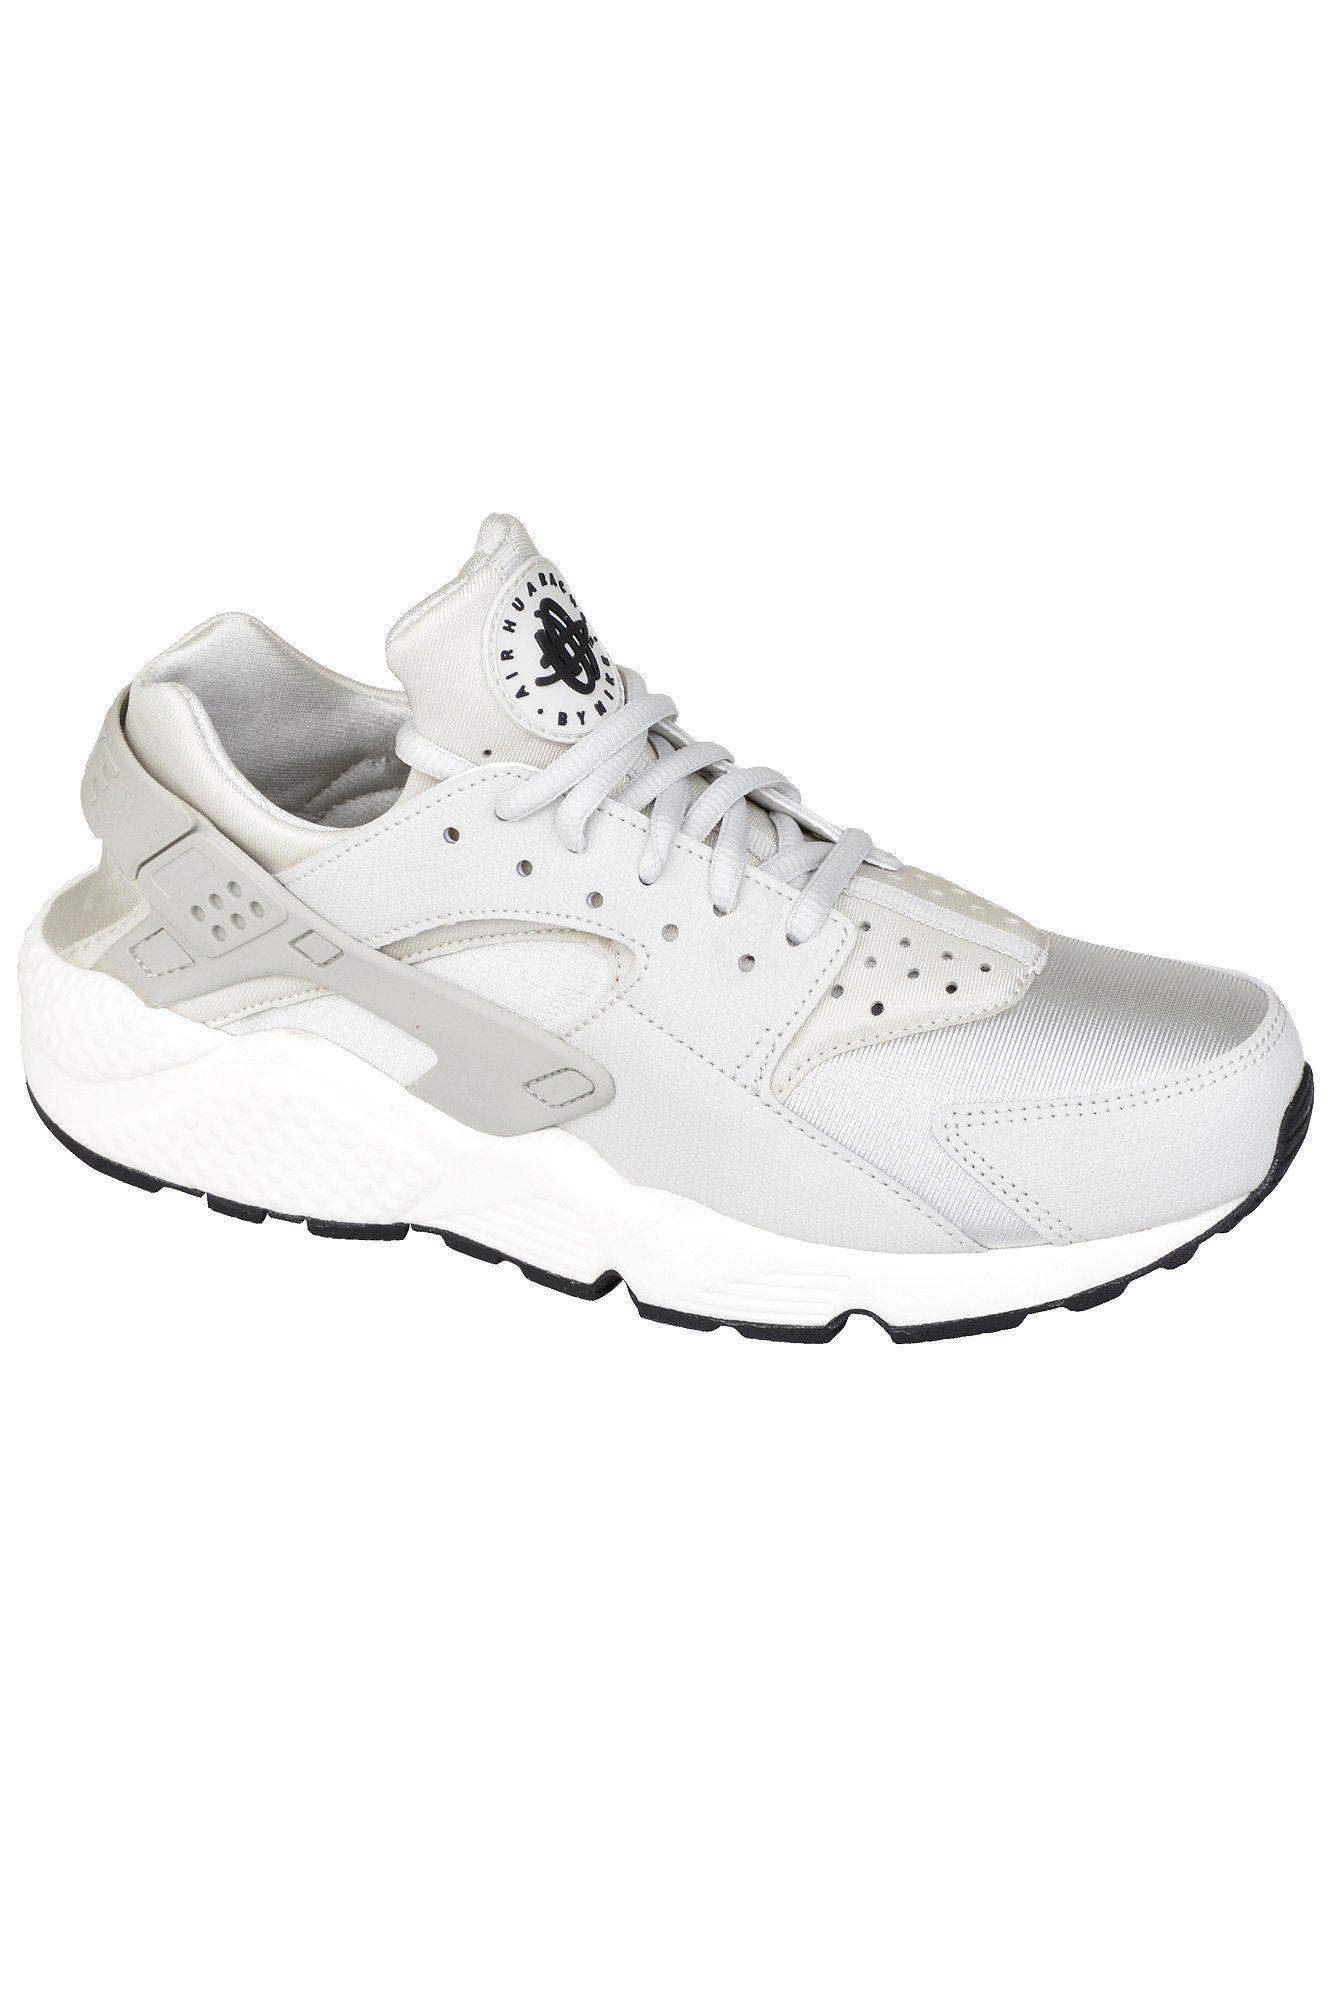 634835 007 Wmns Air Huarache Run Light Bone Nike Buty Damskie Air Huarache Huarache Run Huaraches